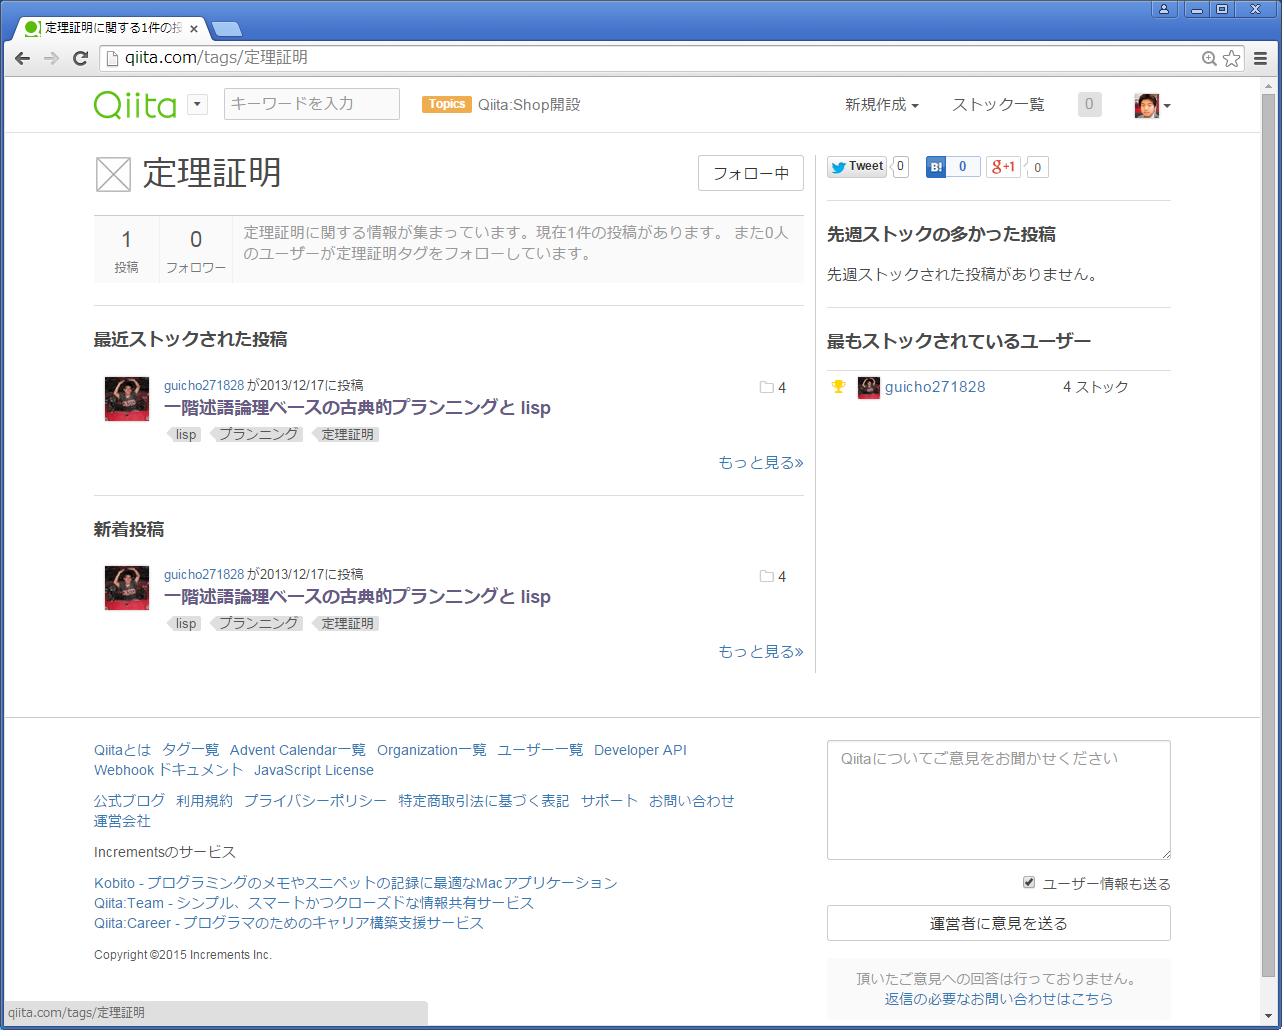 Qiita_teirishoumei_tag.png